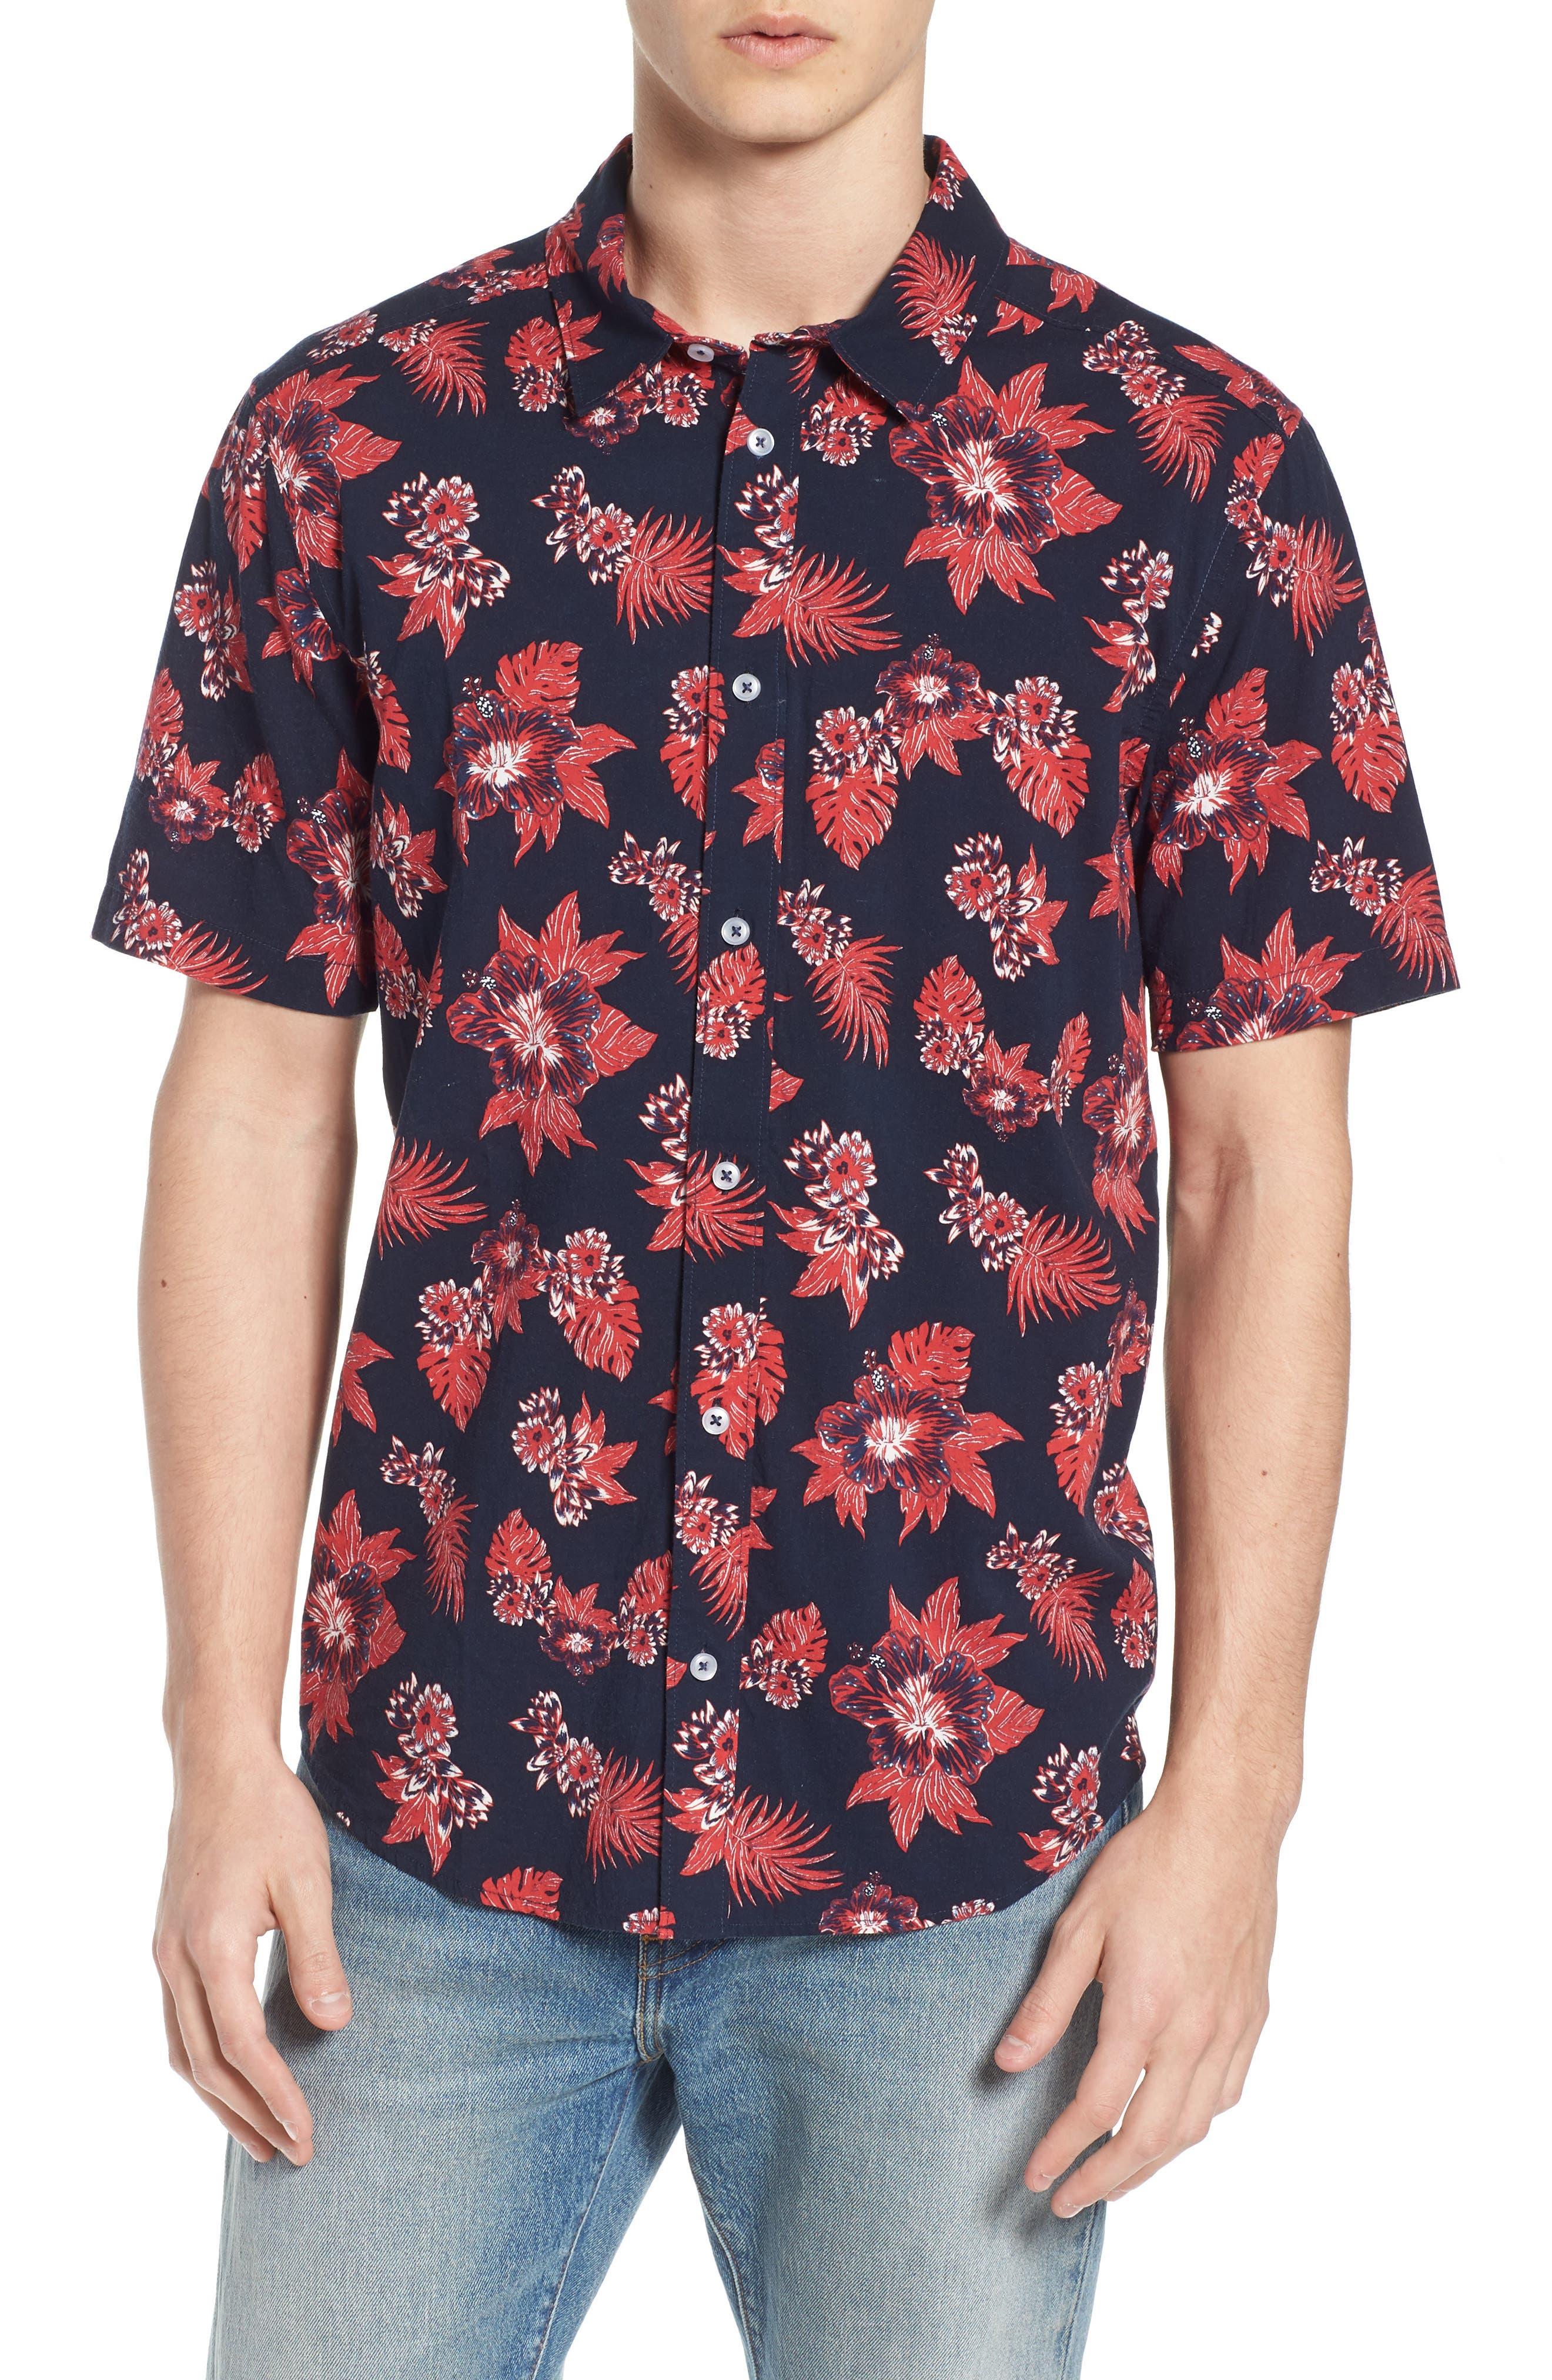 McMillian Woven Shirt,                             Main thumbnail 1, color,                             402